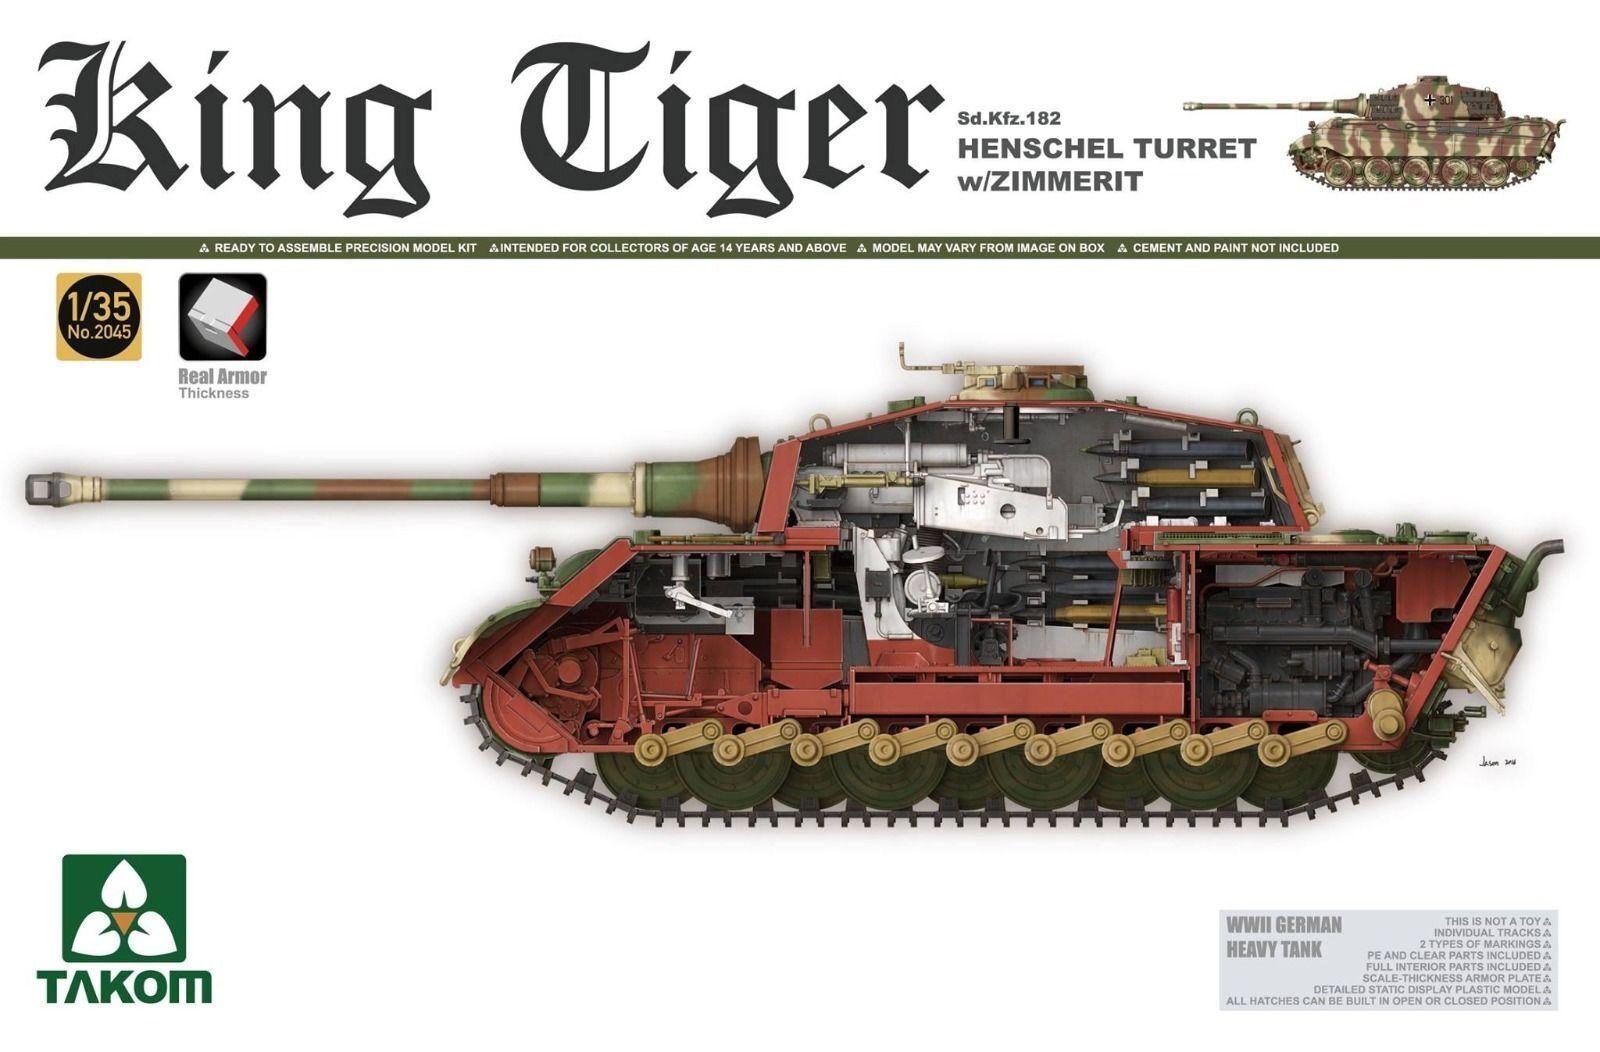 Takom 1 35 2045 Sd.Kfz.182 King Tiger Henschel Turret w Zimmerit